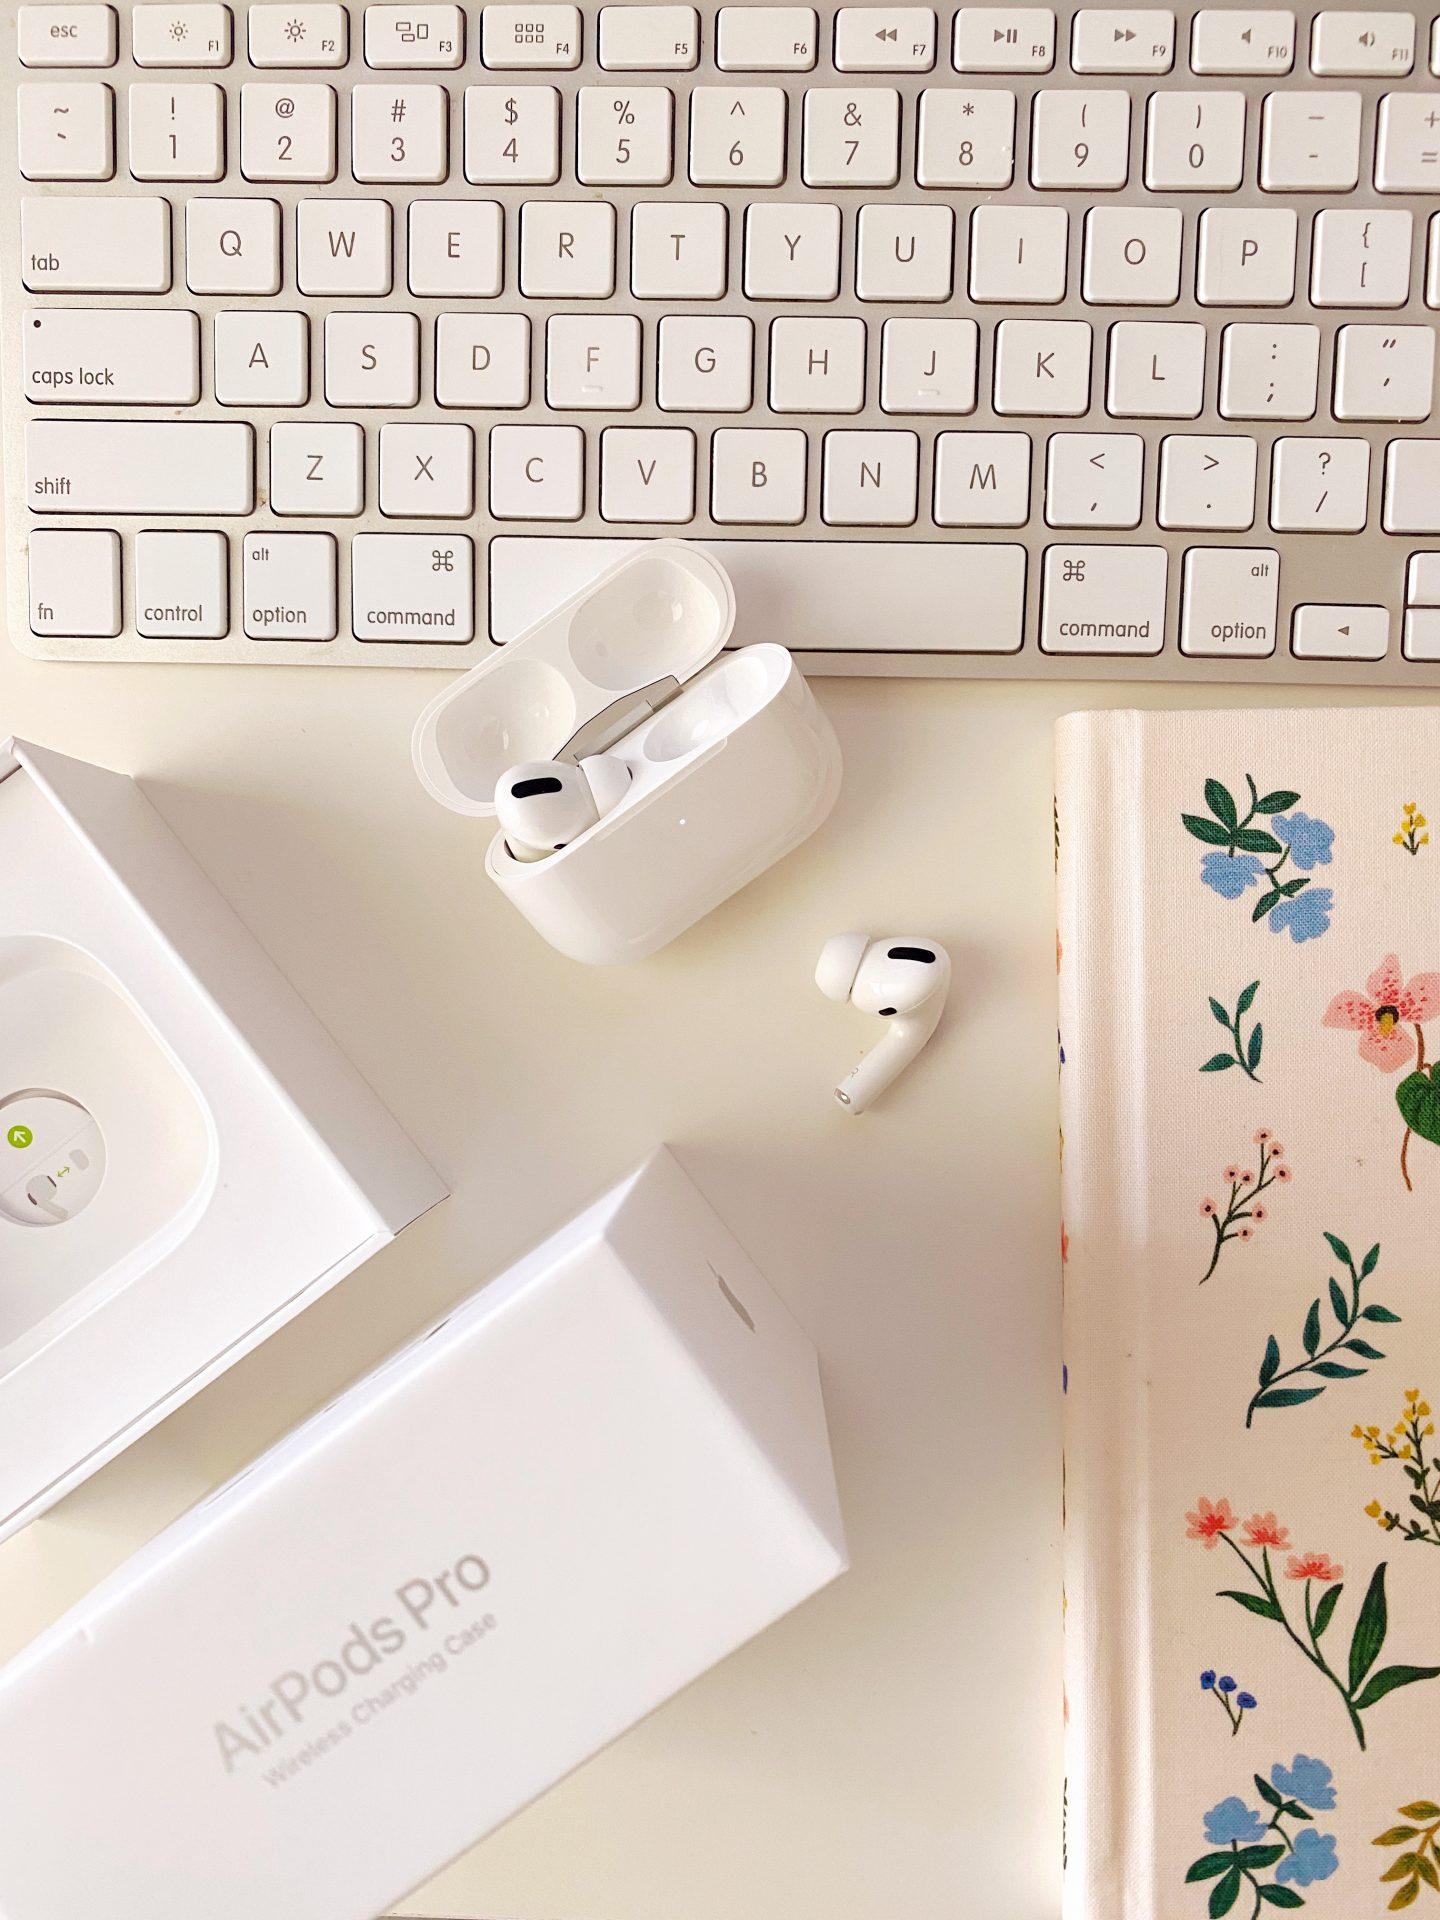 Apple AirPods Pro on Ashley Brooke's desk